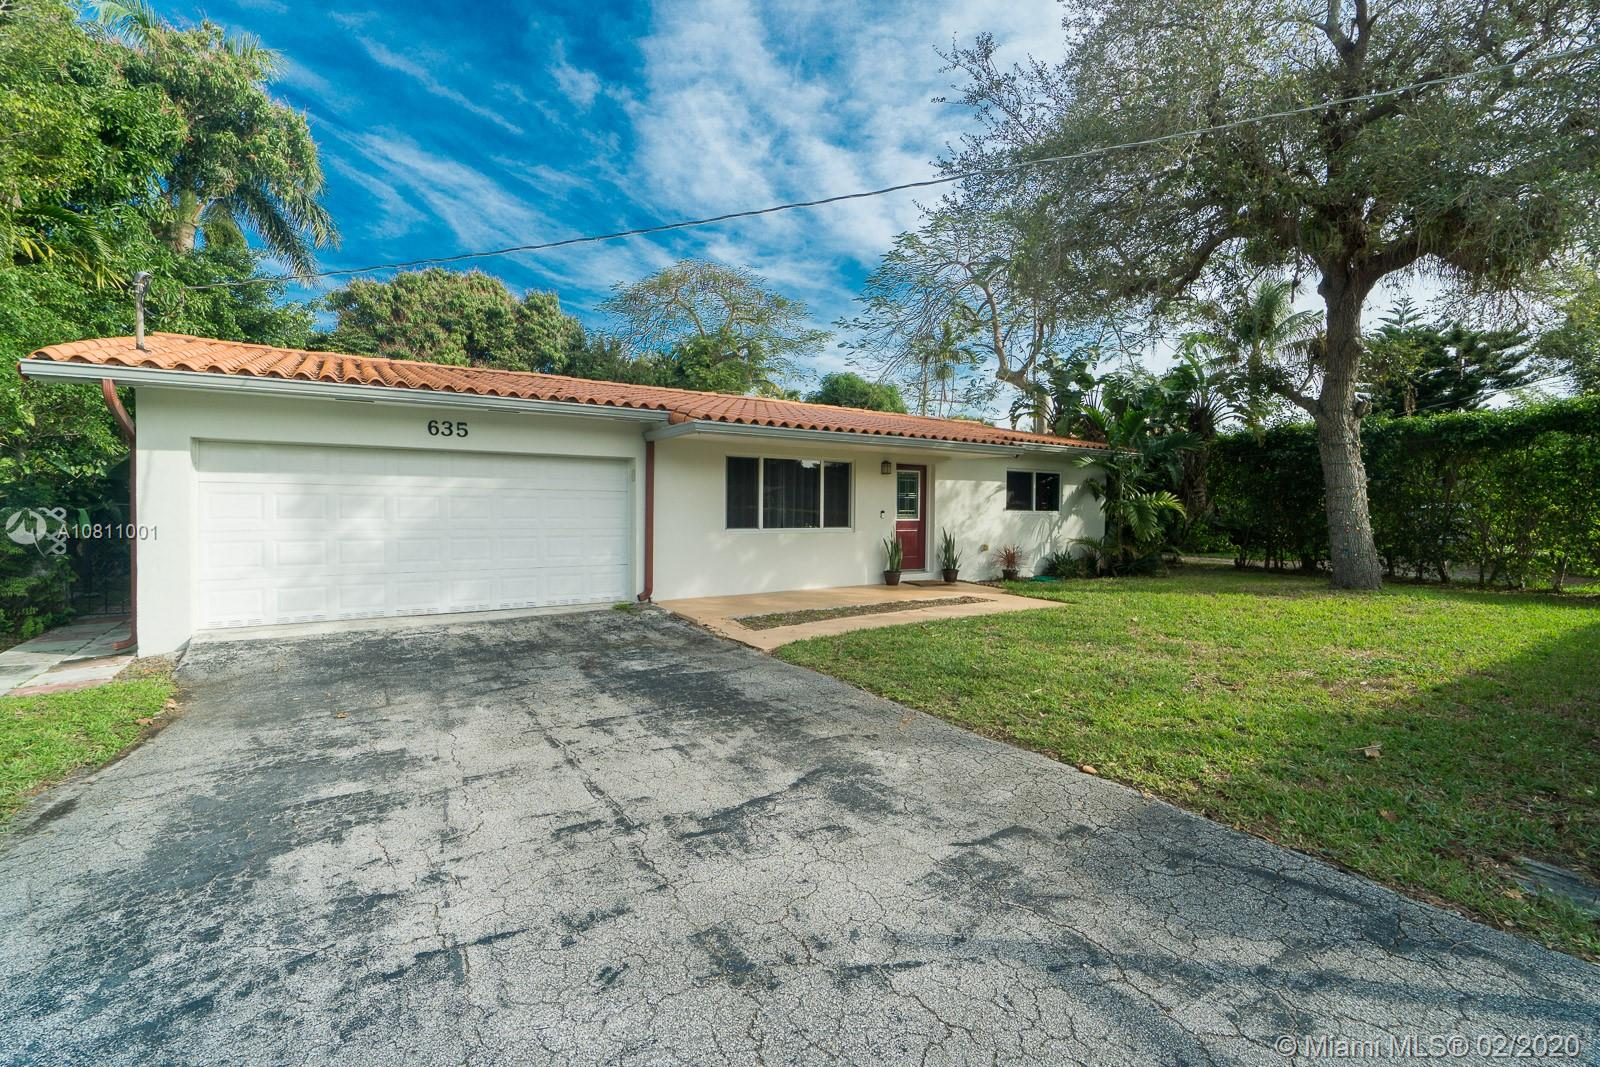 635 NE 116th St Property Photo - Biscayne Park, FL real estate listing